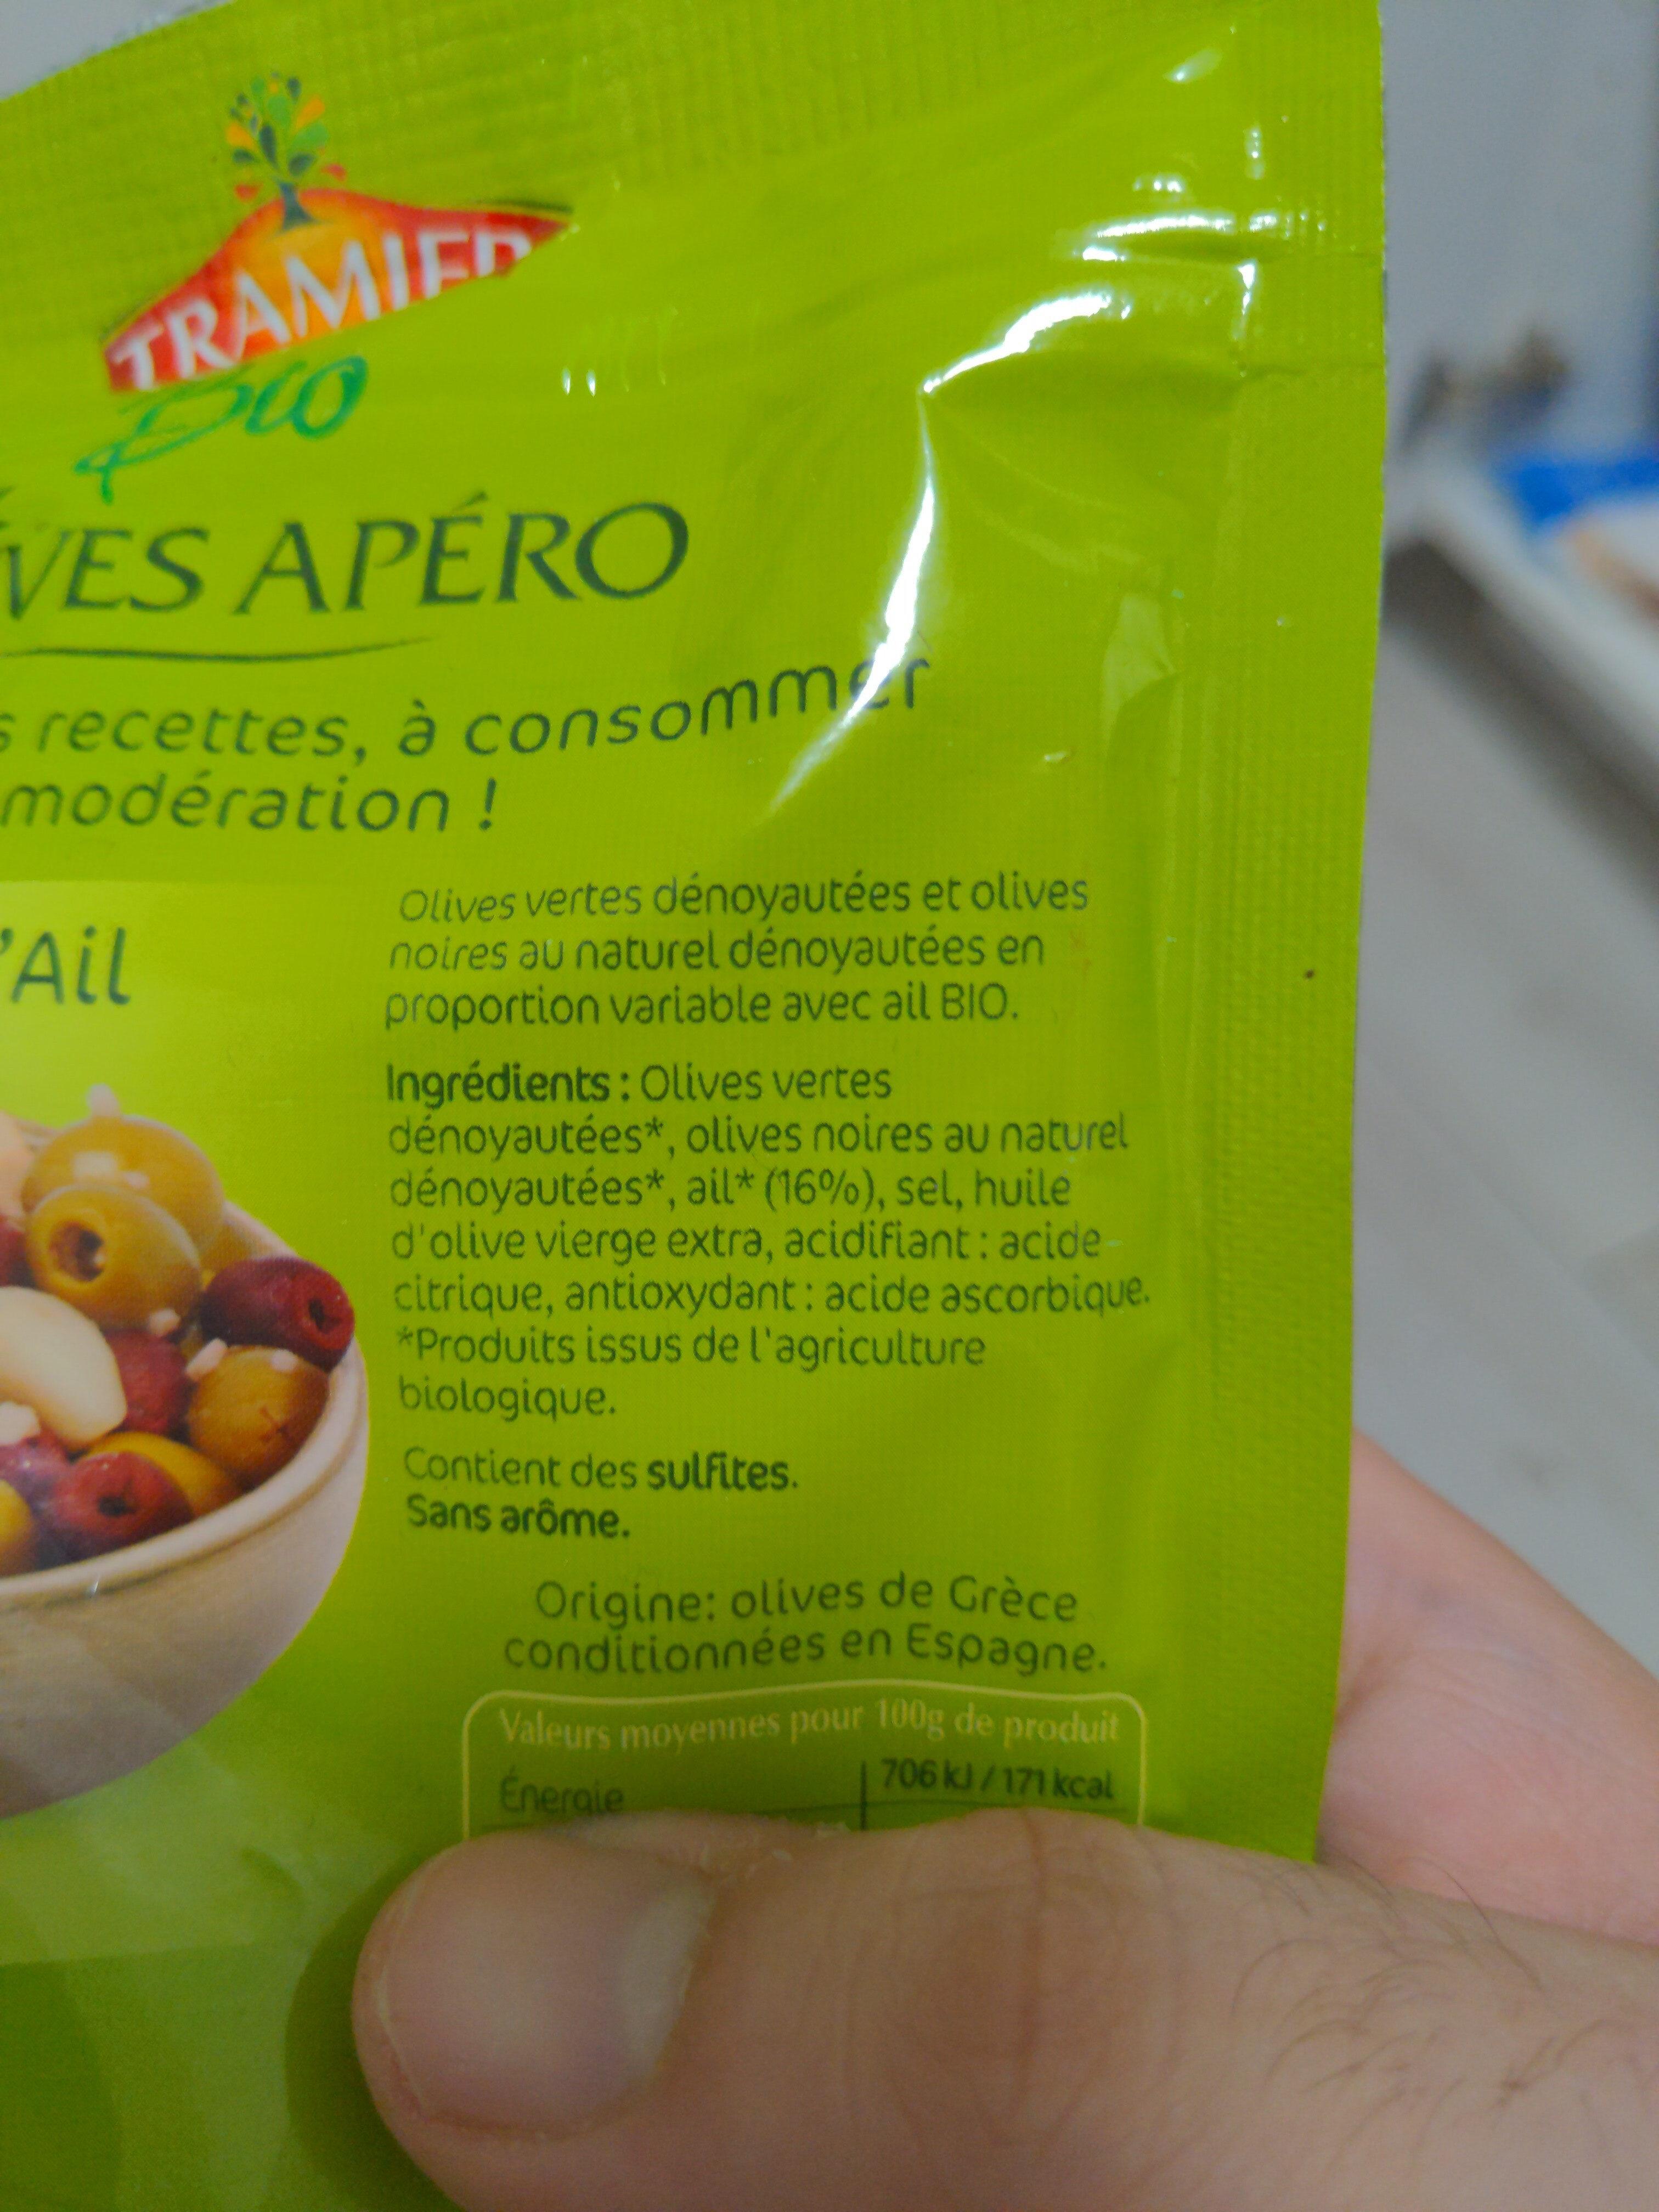 Olives apéro Mix à l'ail Bio 150g Tramier - Inhaltsstoffe - fr